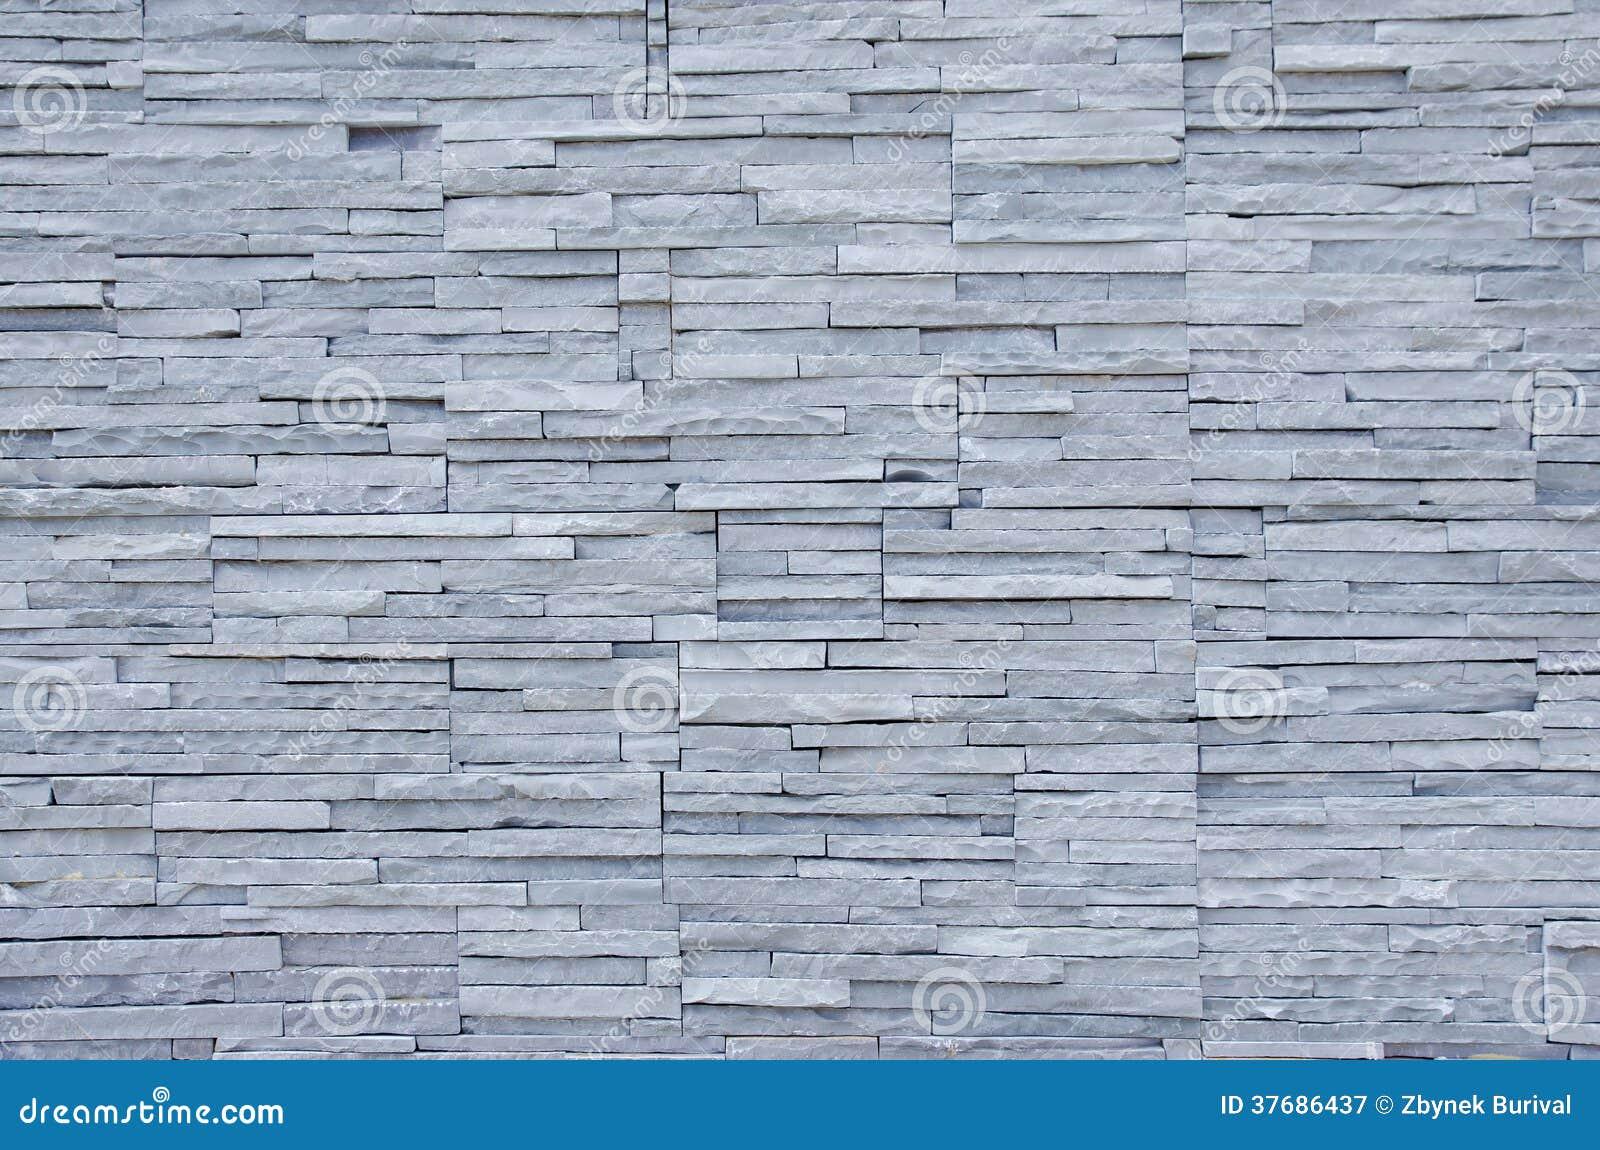 Natural Limestone Tiles Texture Stock Image - Image of stony ...